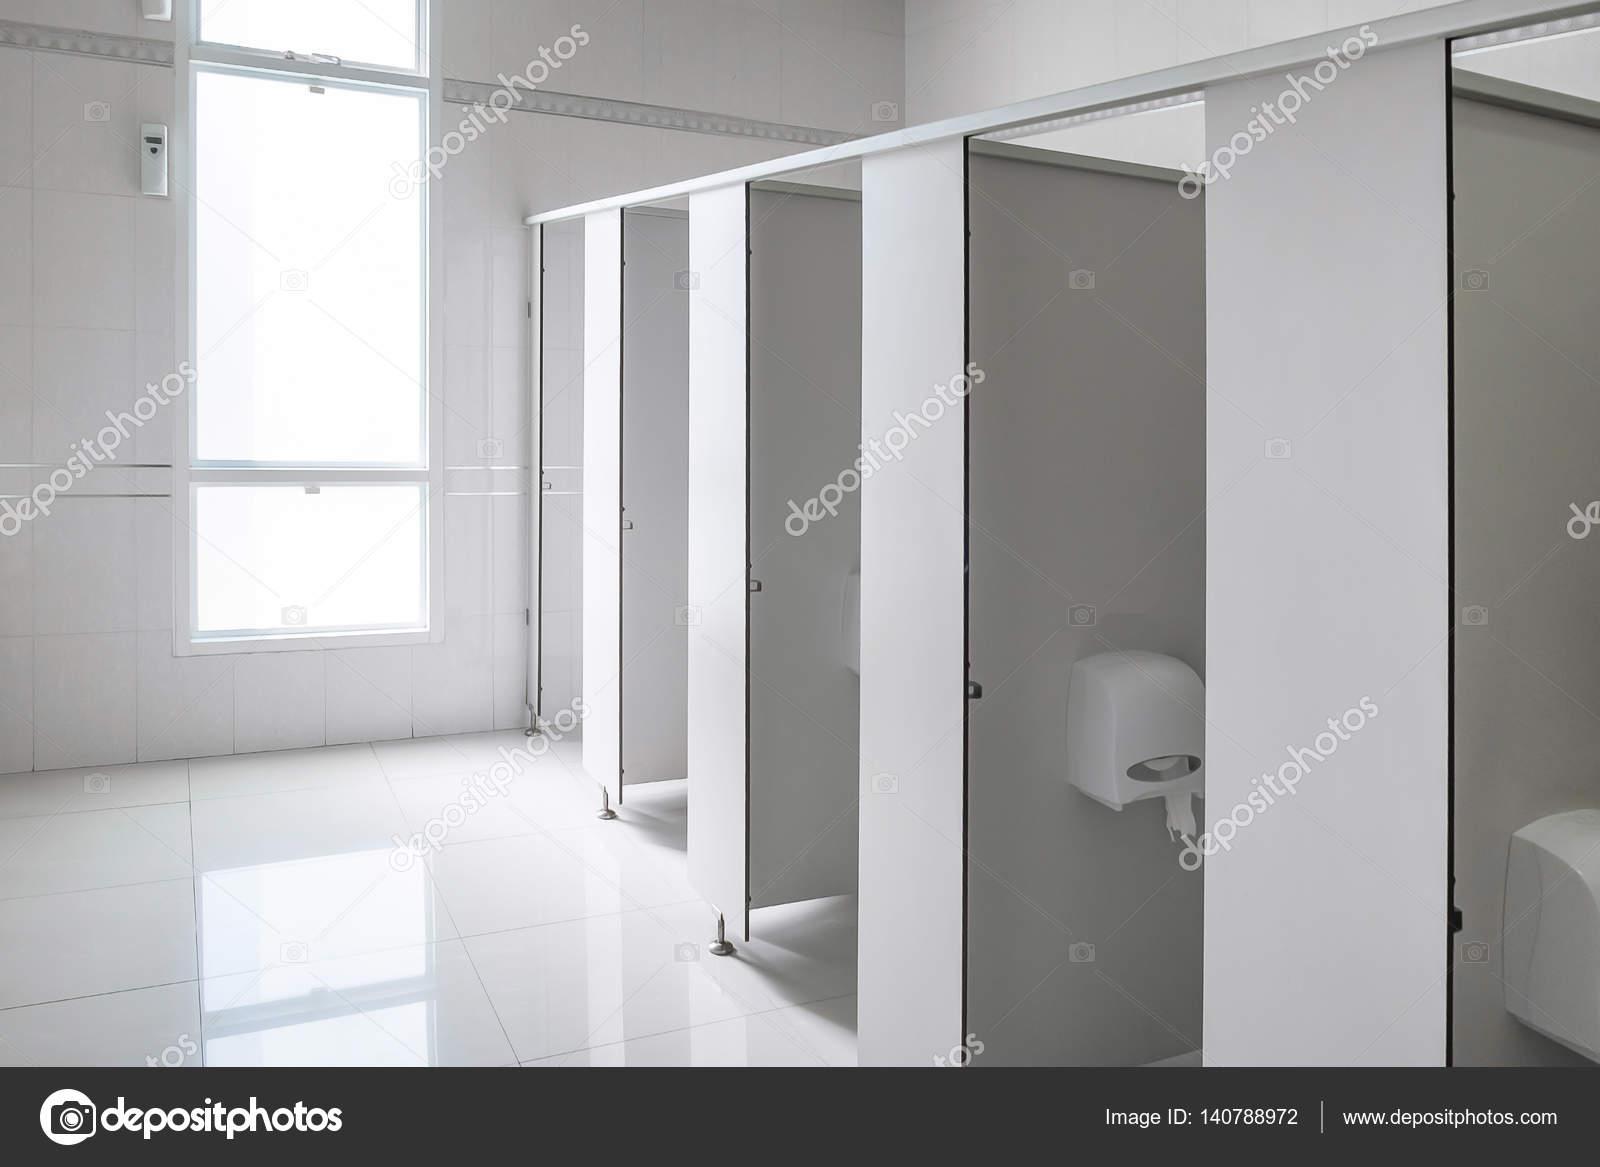 Clean men public toilet room empty, interior design — Stock Photo ...